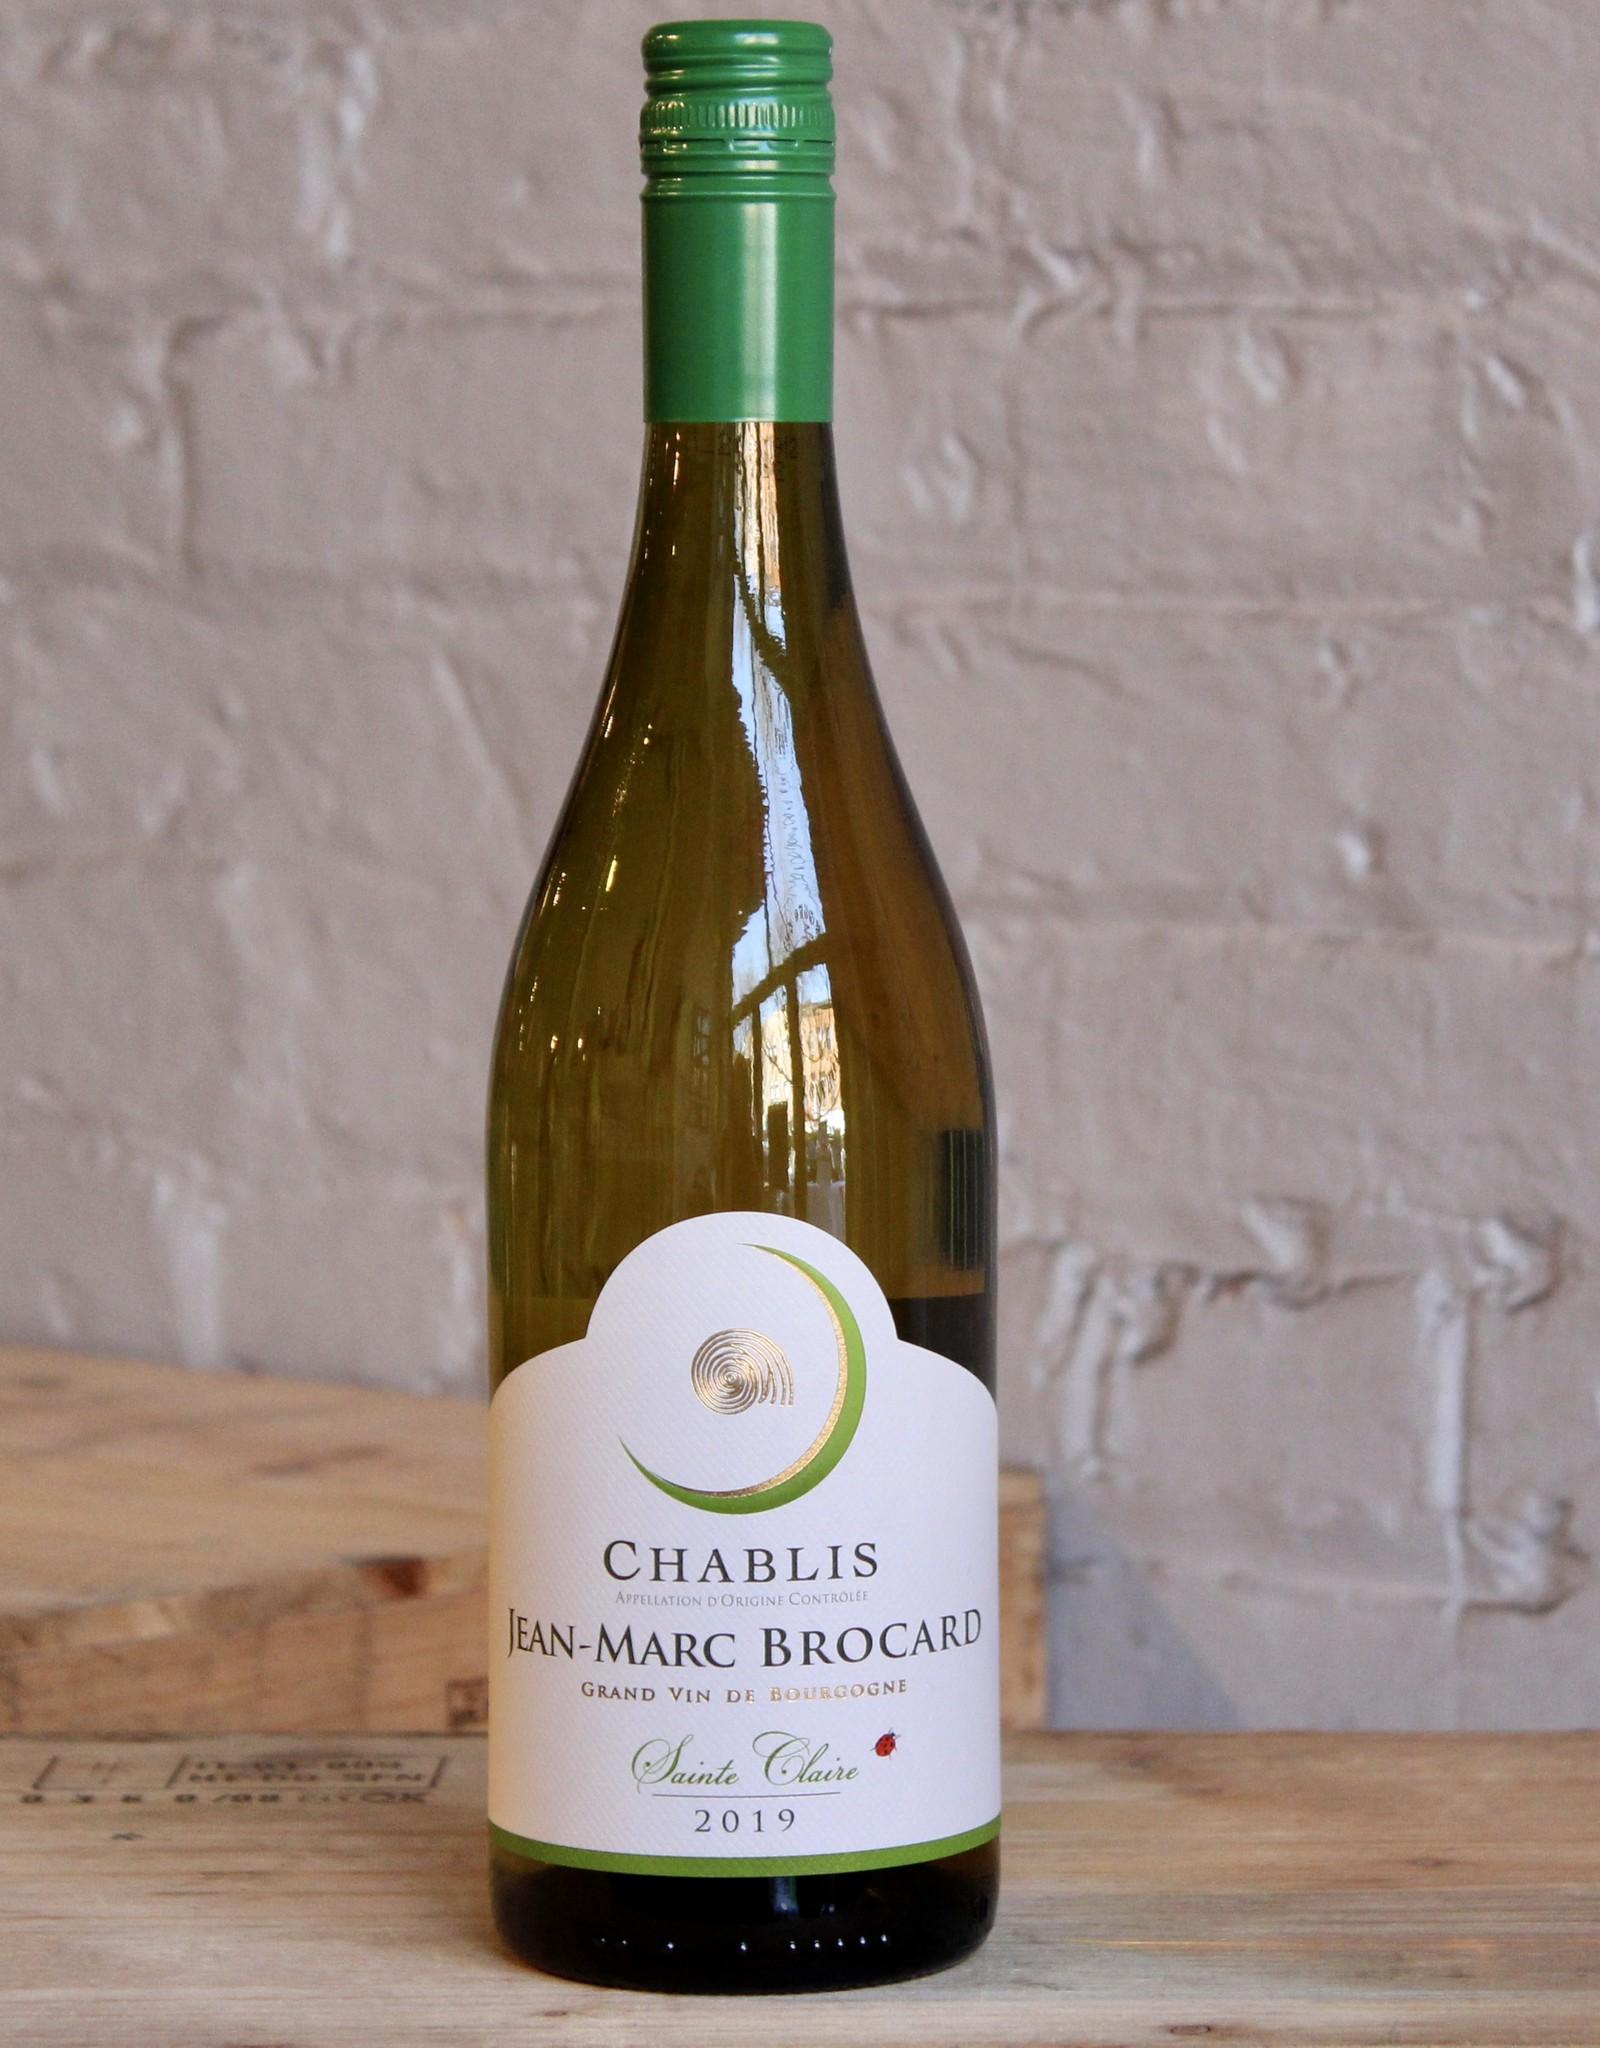 Wine 2019 Jean-Marc Brocard Chablis Sainte Claire - Burgundy, France (750ml)